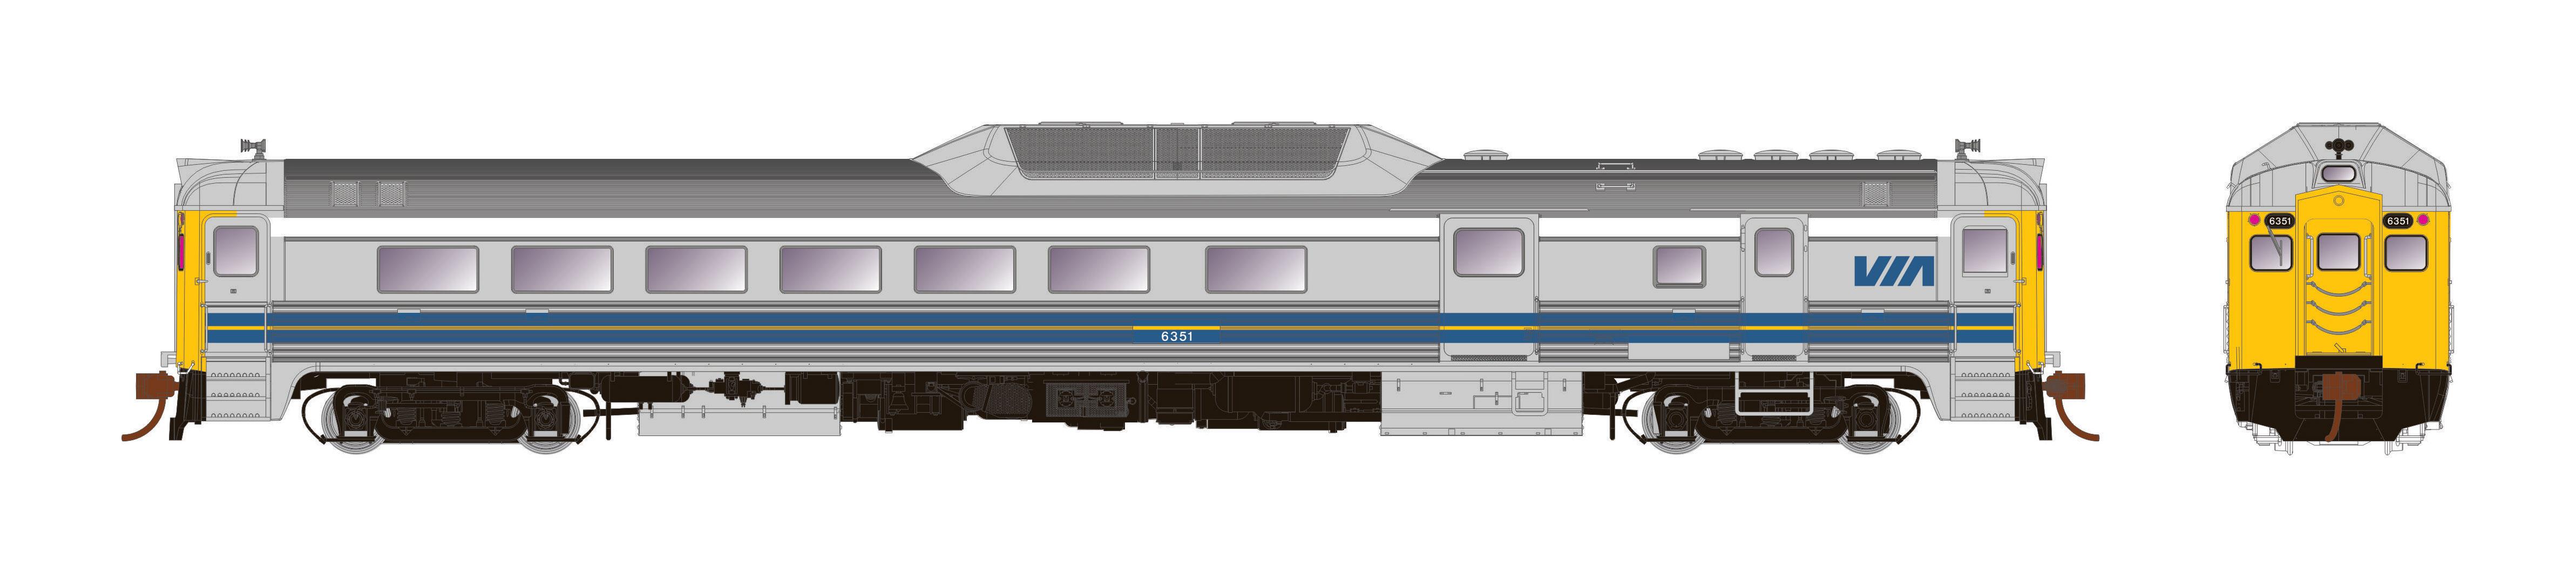 Rapido Trains 16750 - HO Budd RDC-3 - PH2 - DCC/Sound - VIA Rail #6356